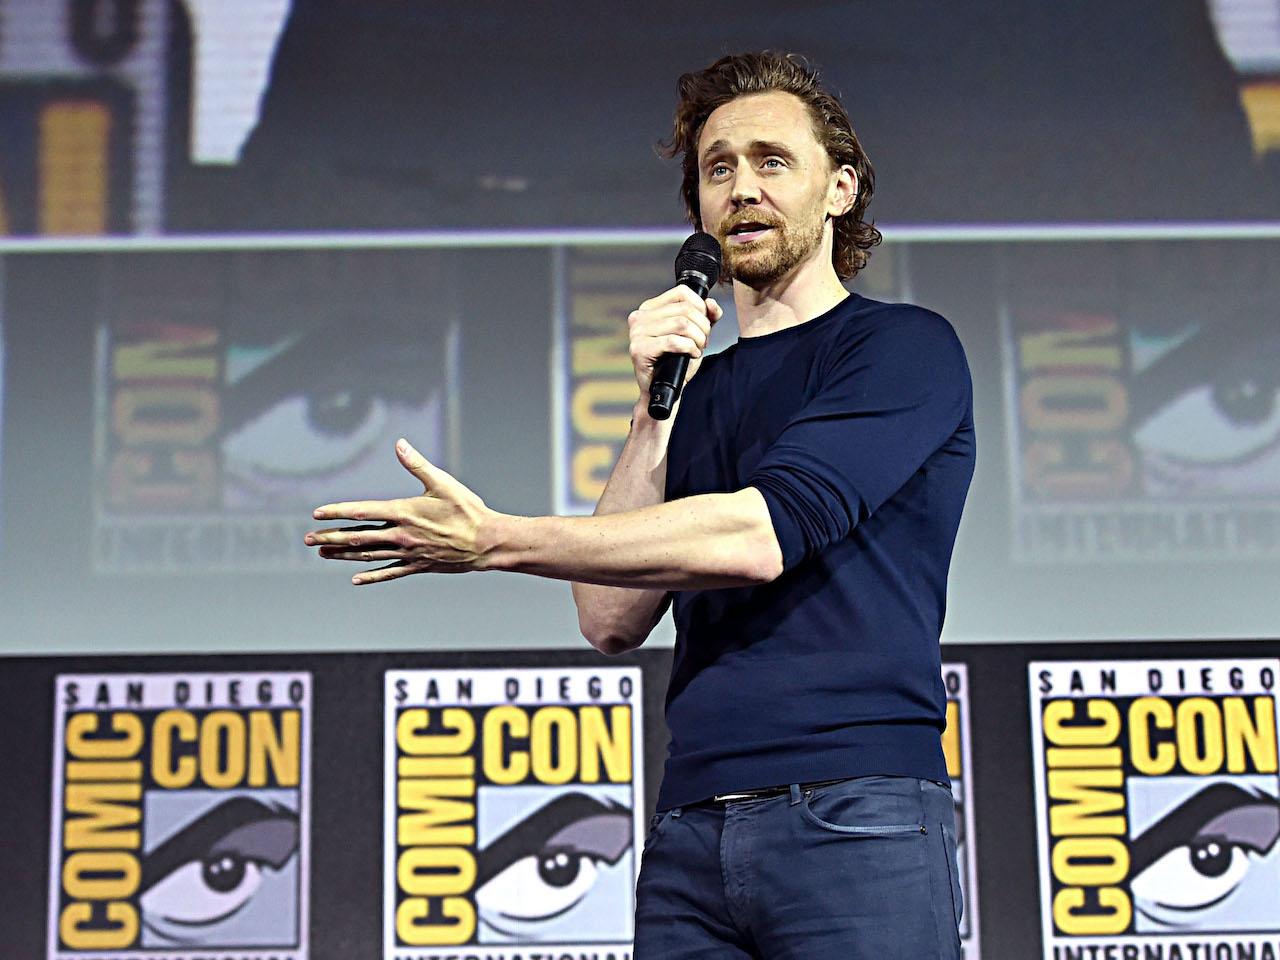 Tom Hiddleston, star of Marvel Studios' 'Loki', at San Diego Comic-Con International 2019